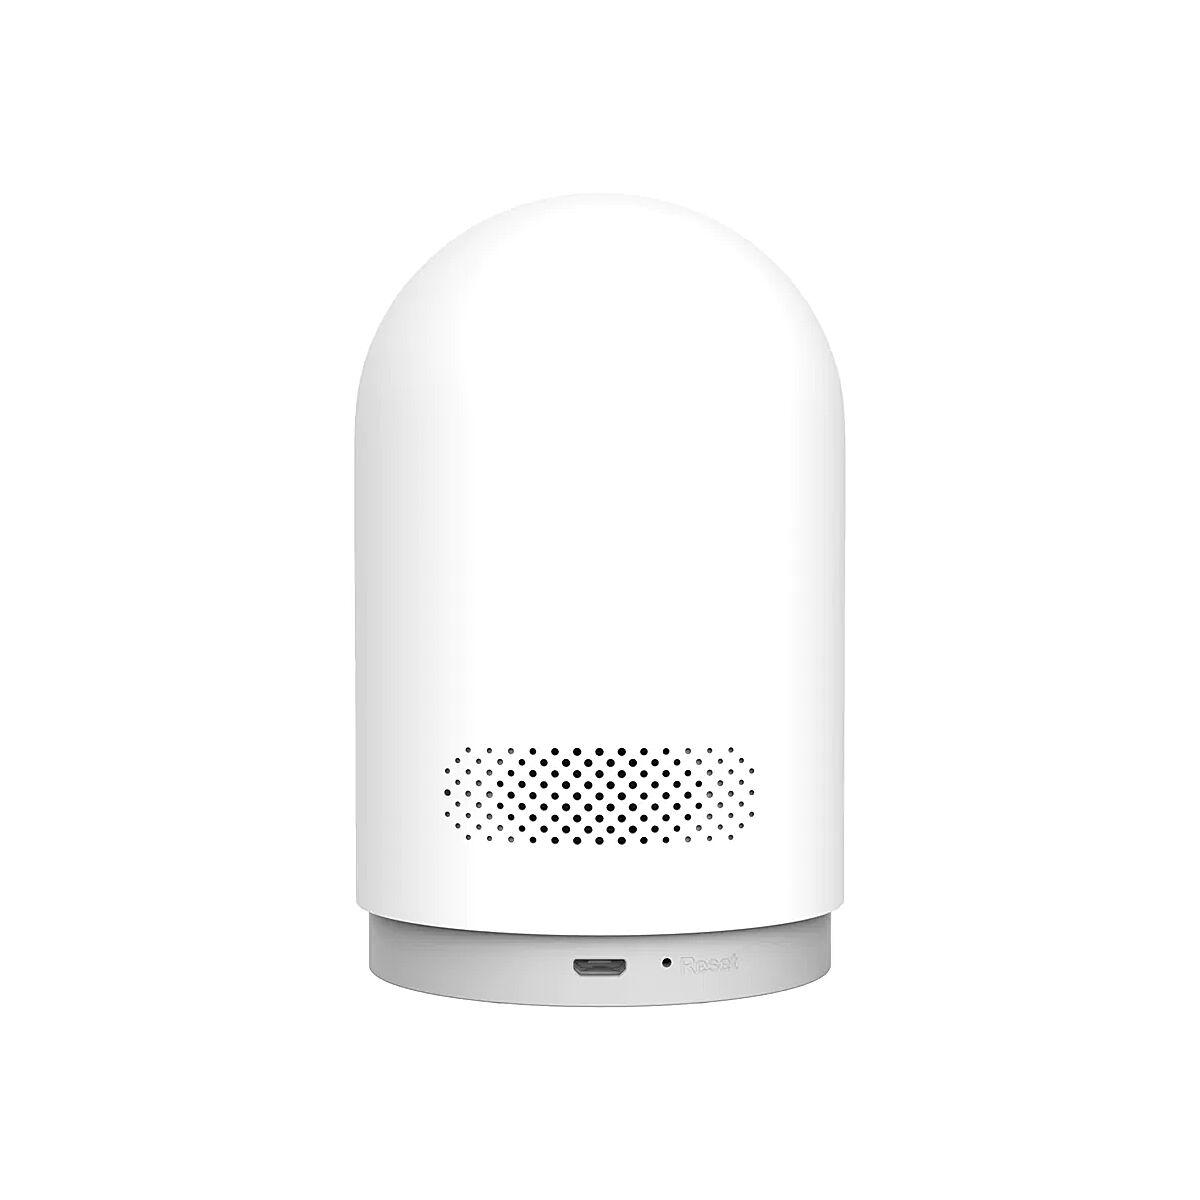 Xiaomi Mi Home Security Camera 360 2K Pro biztonsági kamera, fehér  EU